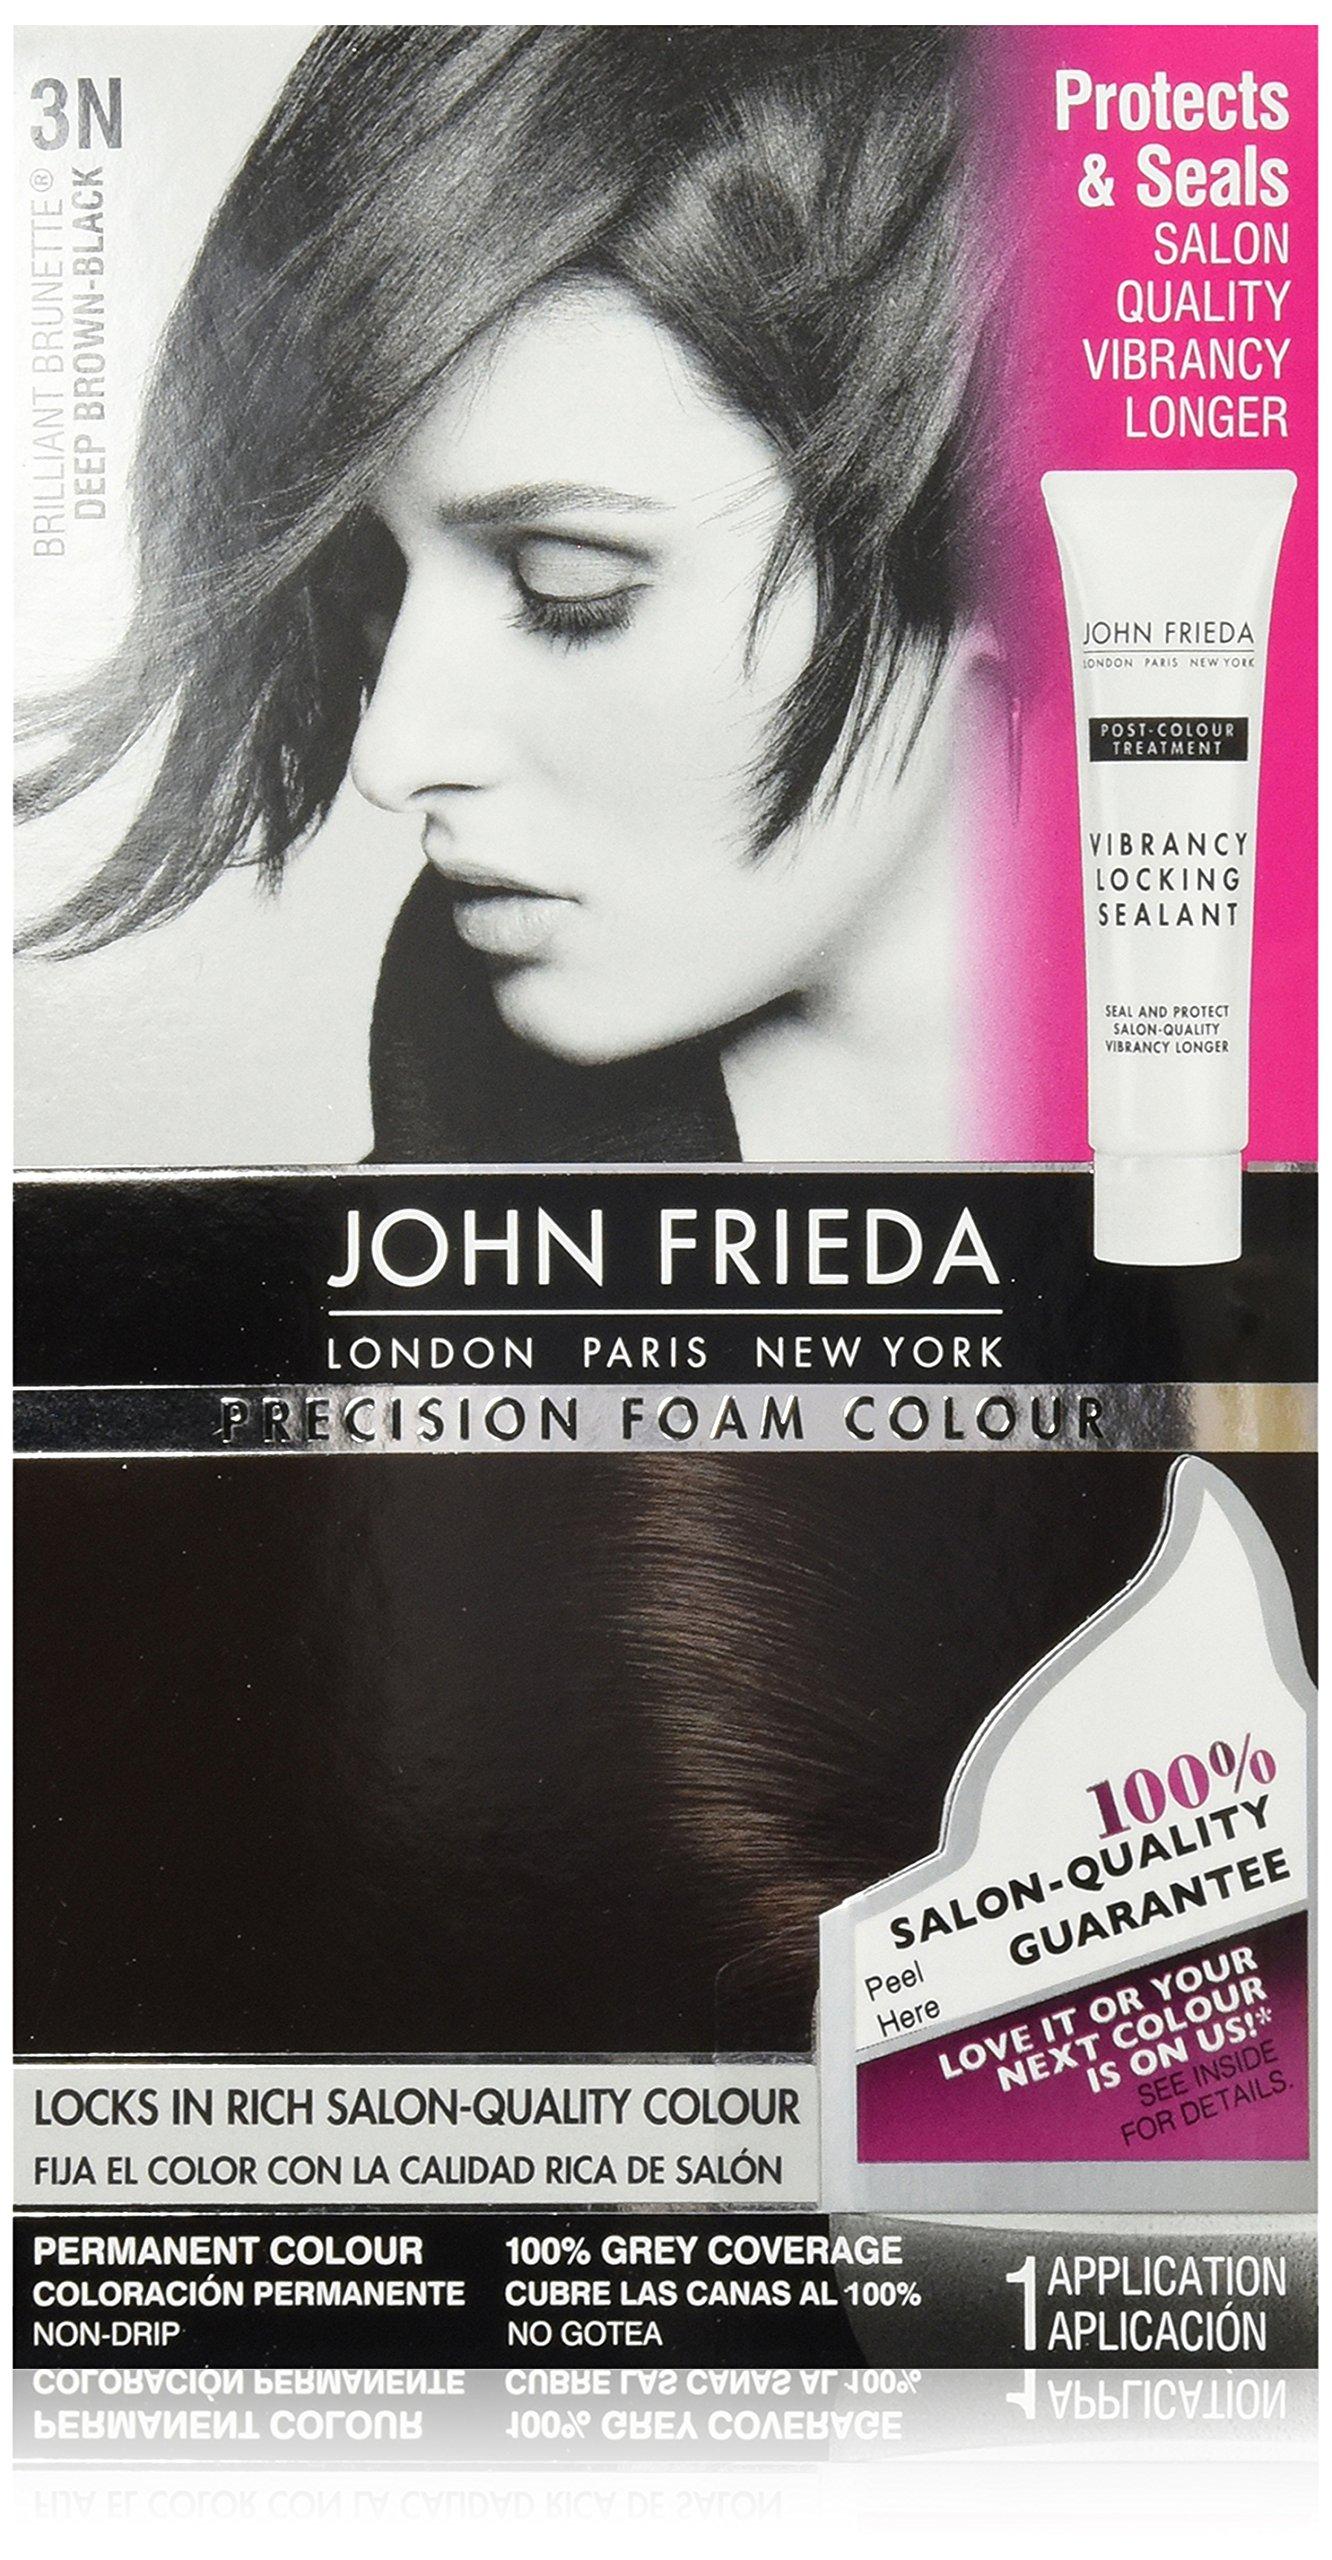 John Frieda Mousse Hair Color